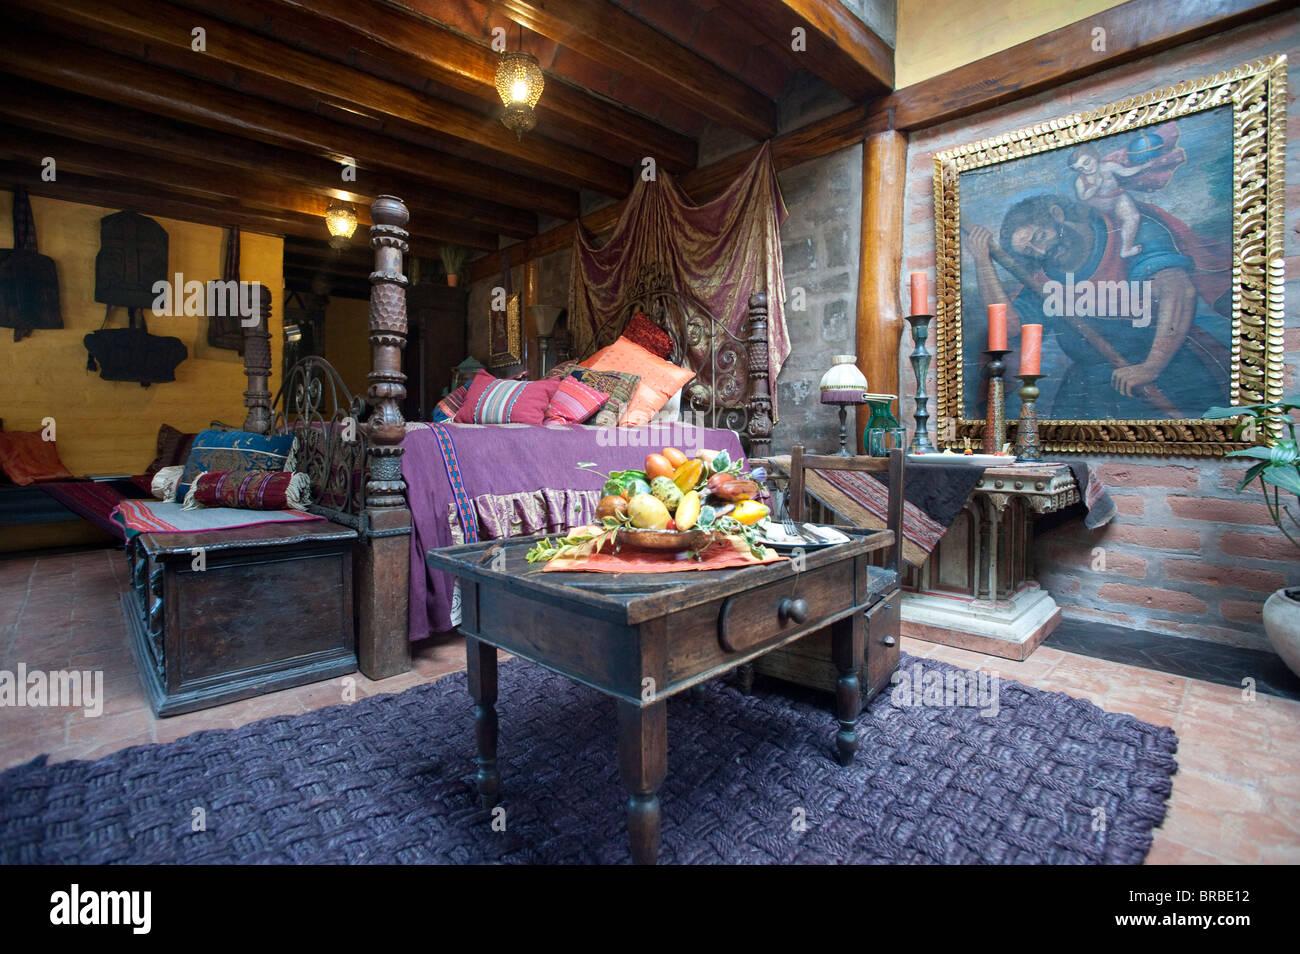 Rumi Loma hotel, Quito, Ecuador Imagen De Stock